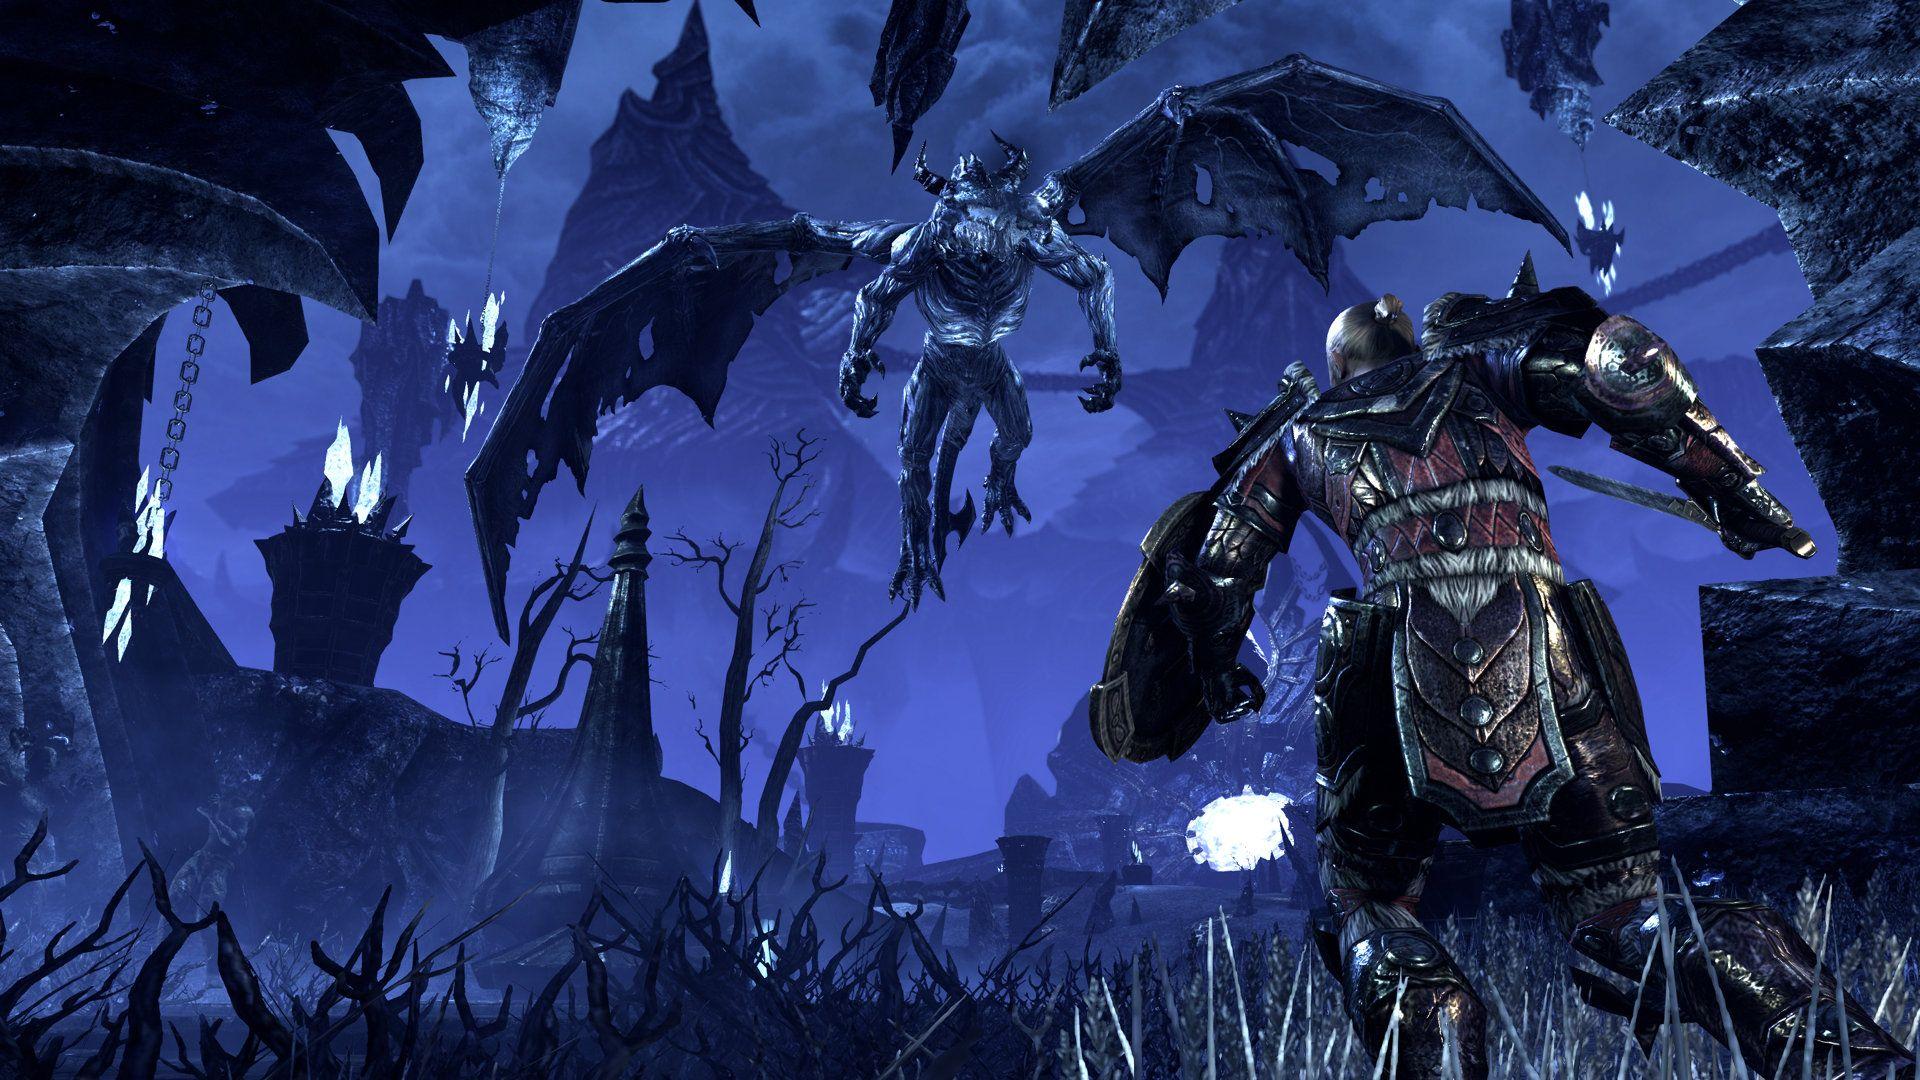 The Elder Scrolls Online: Tamriel Unlimited | PS4 Games